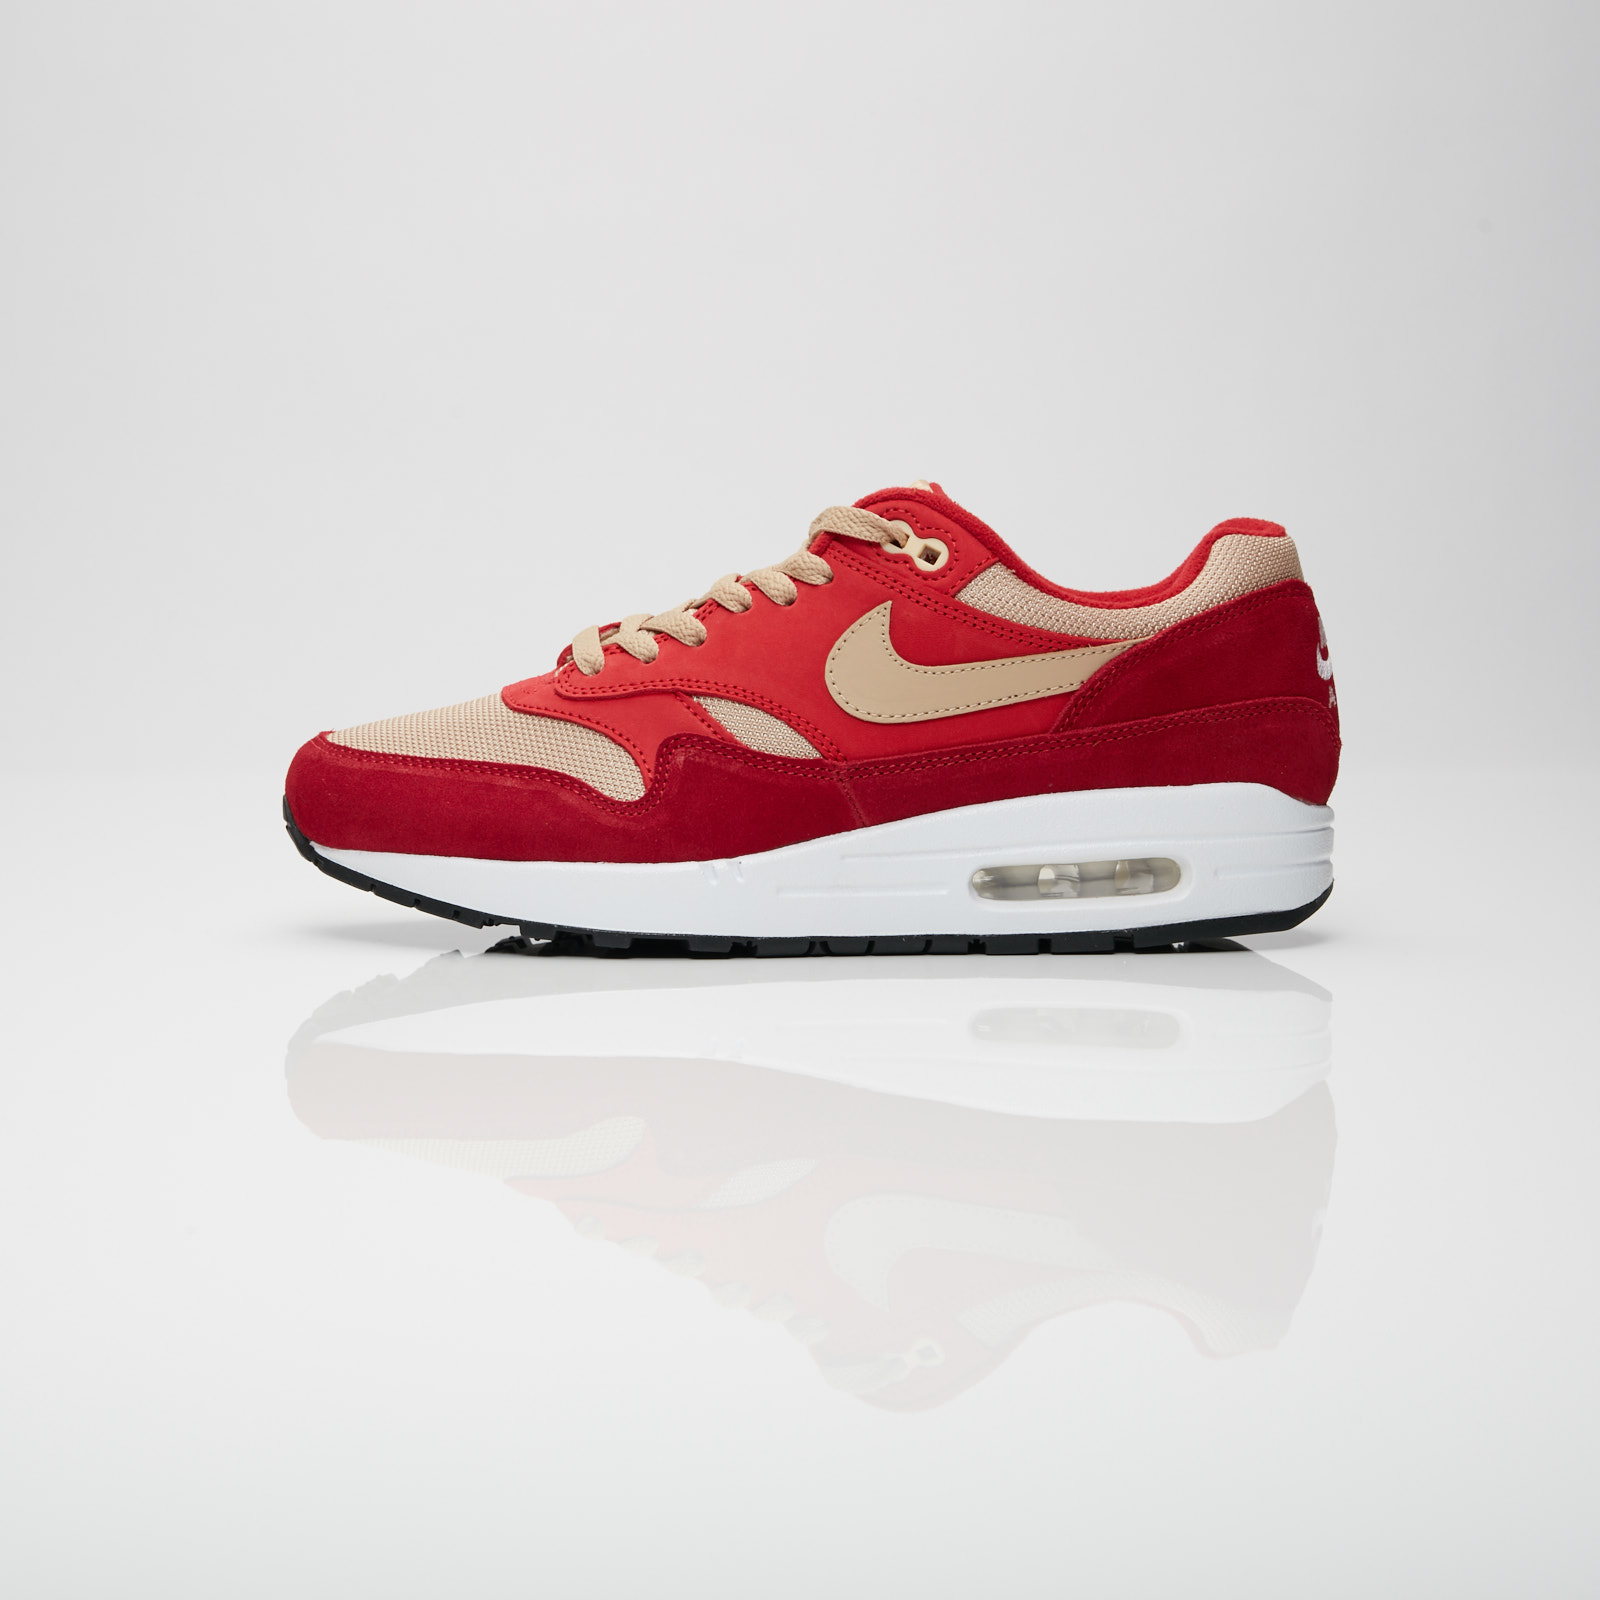 "Men's Nike Air Max 1 Premium ""Red Curry"" 908366 600"